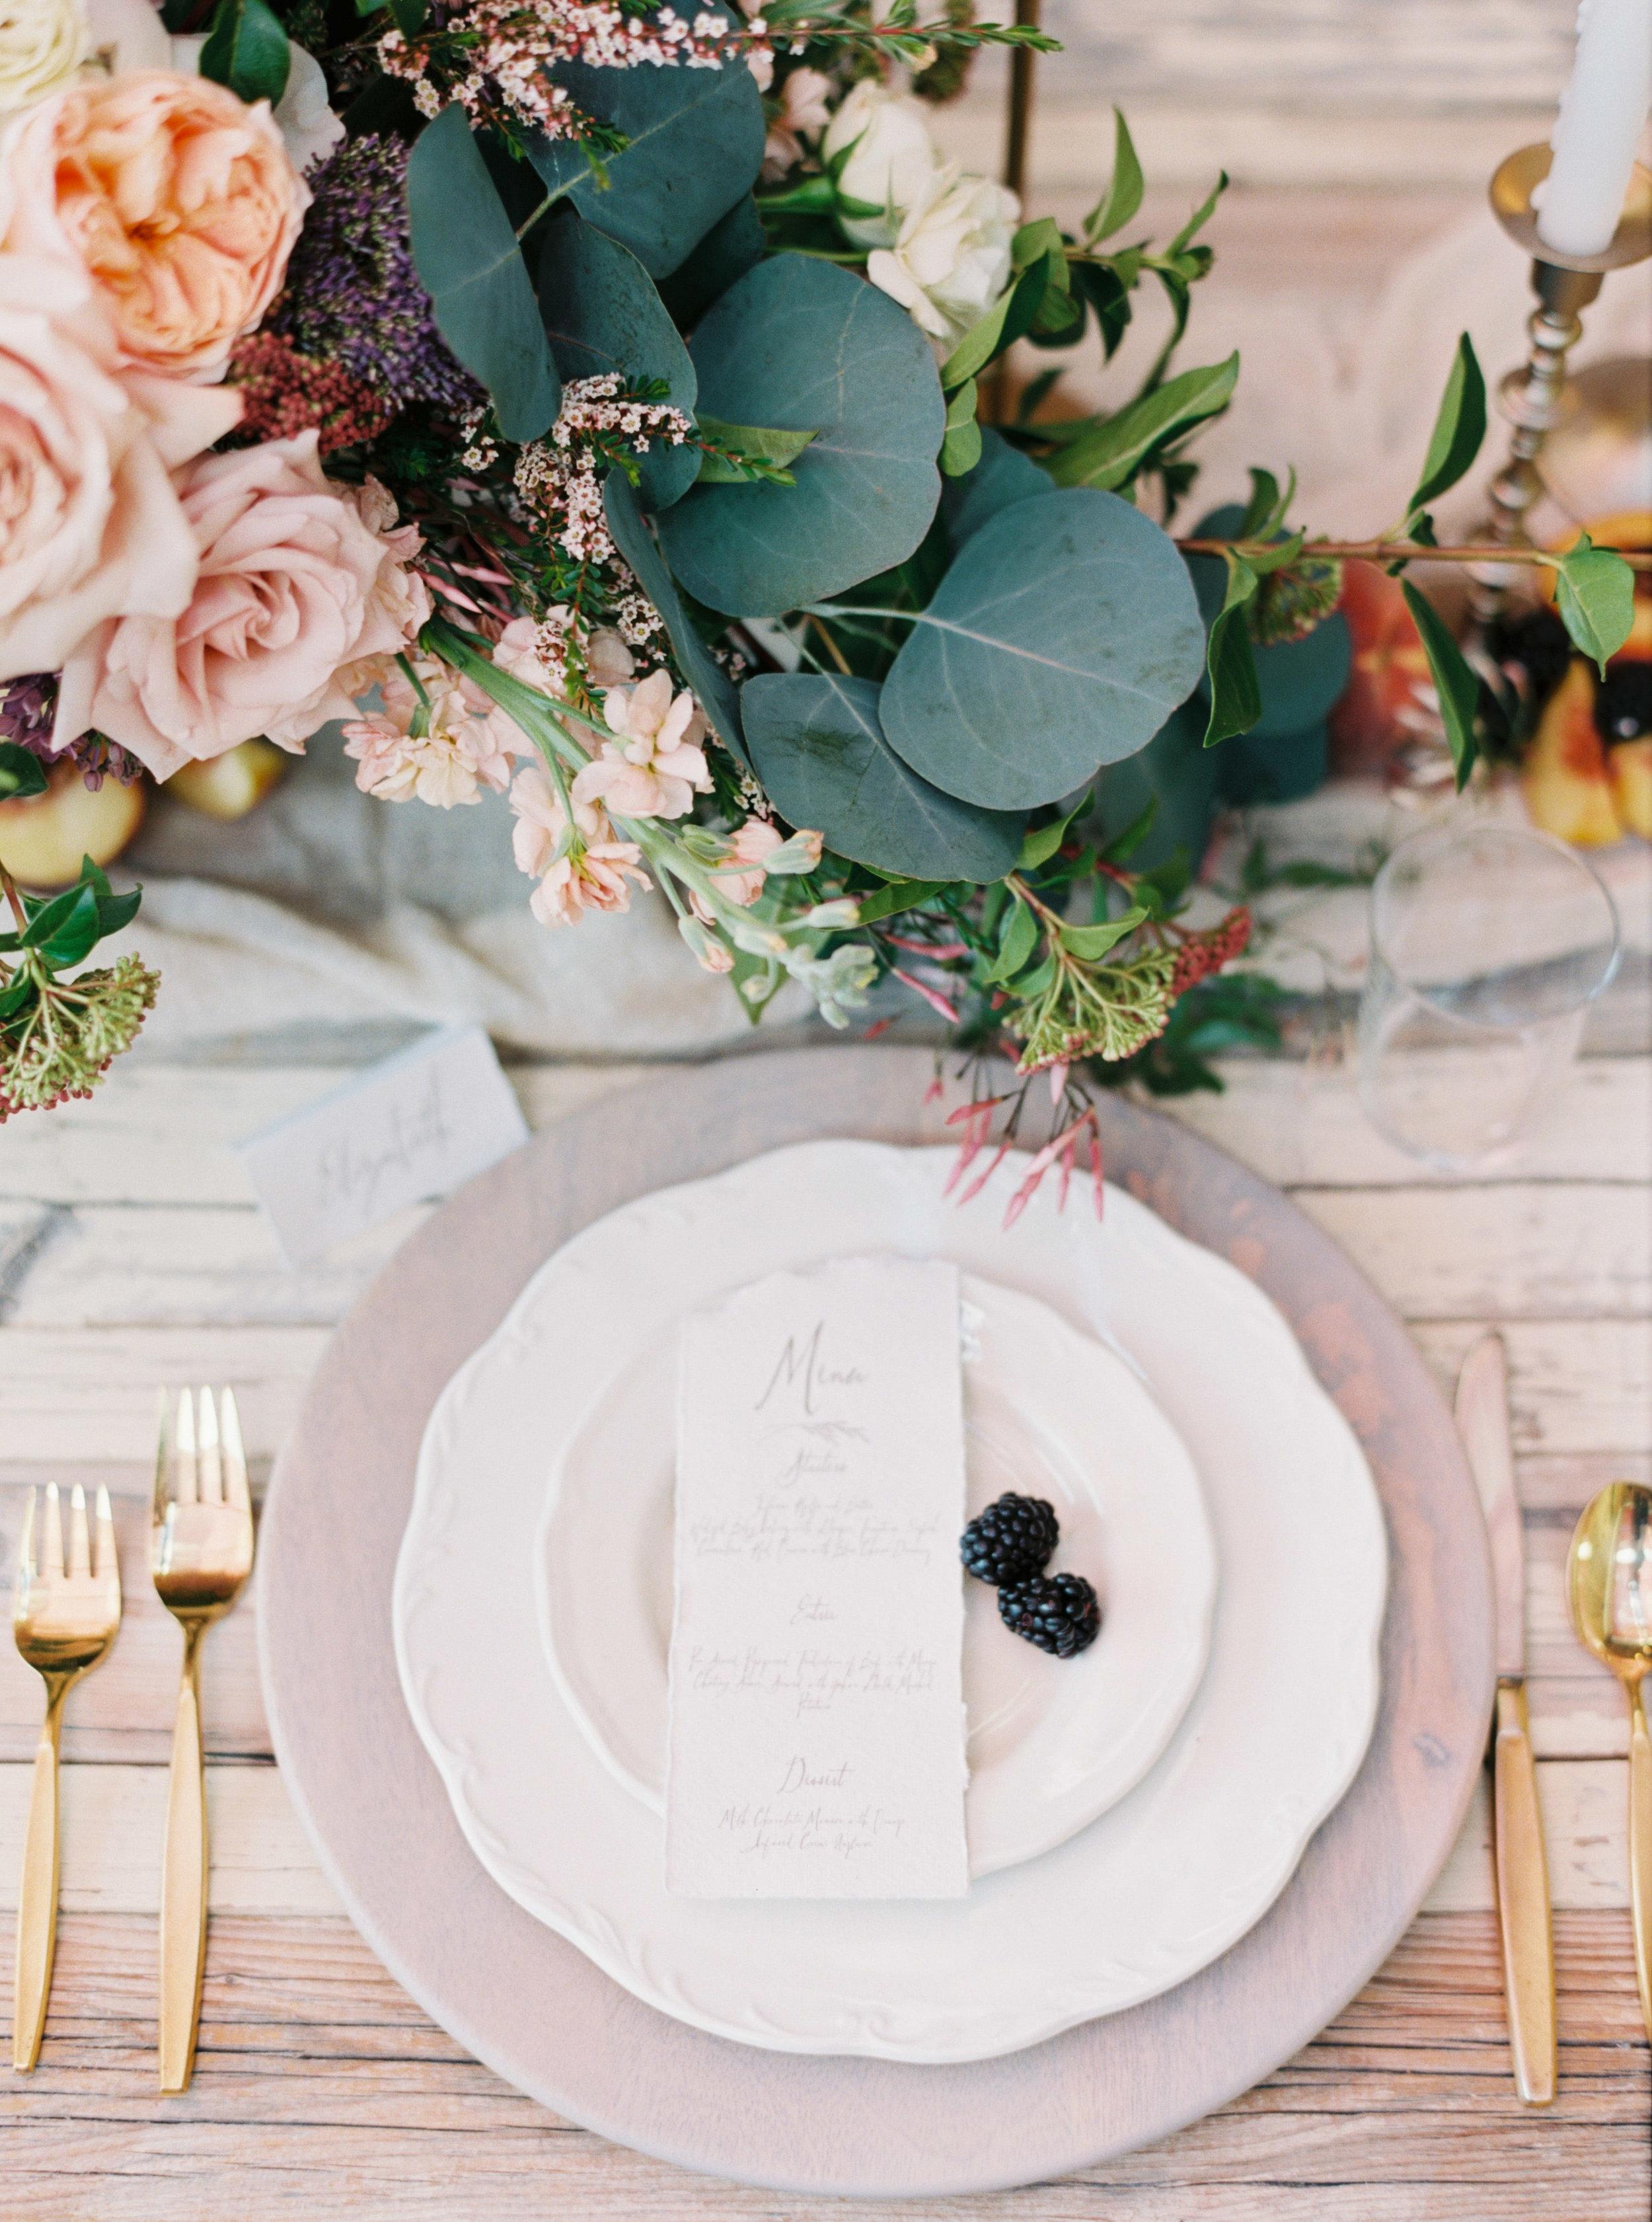 Lisa Catherine Photography - Joy Wed Listing_1.jpg